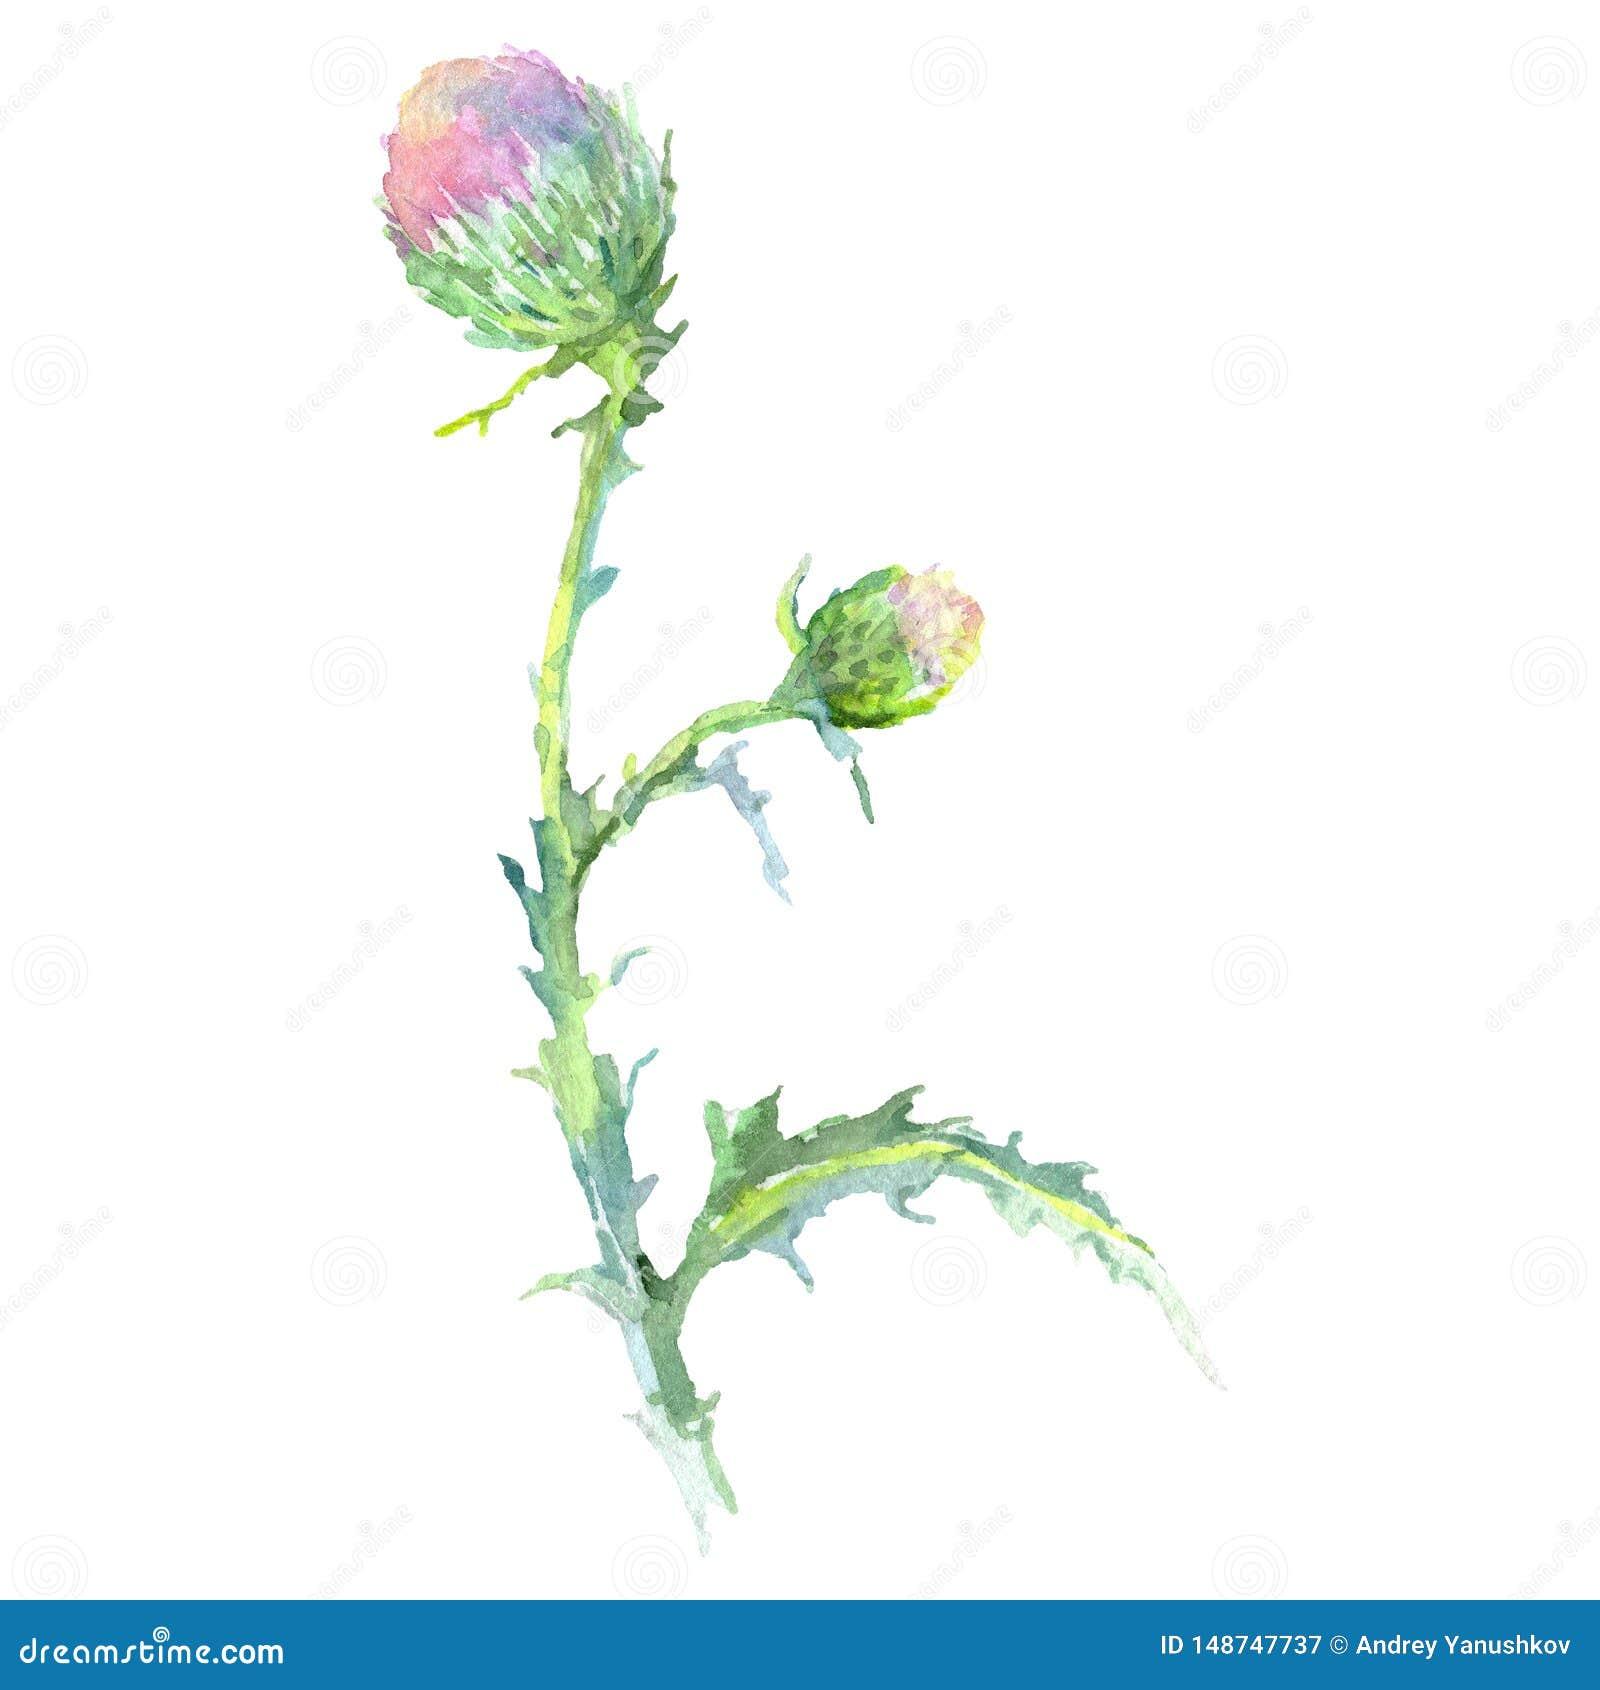 5ddd0fb87 Thistle floral botanical flower. Watercolor background illustration set. Isolated  thistle illustration element.